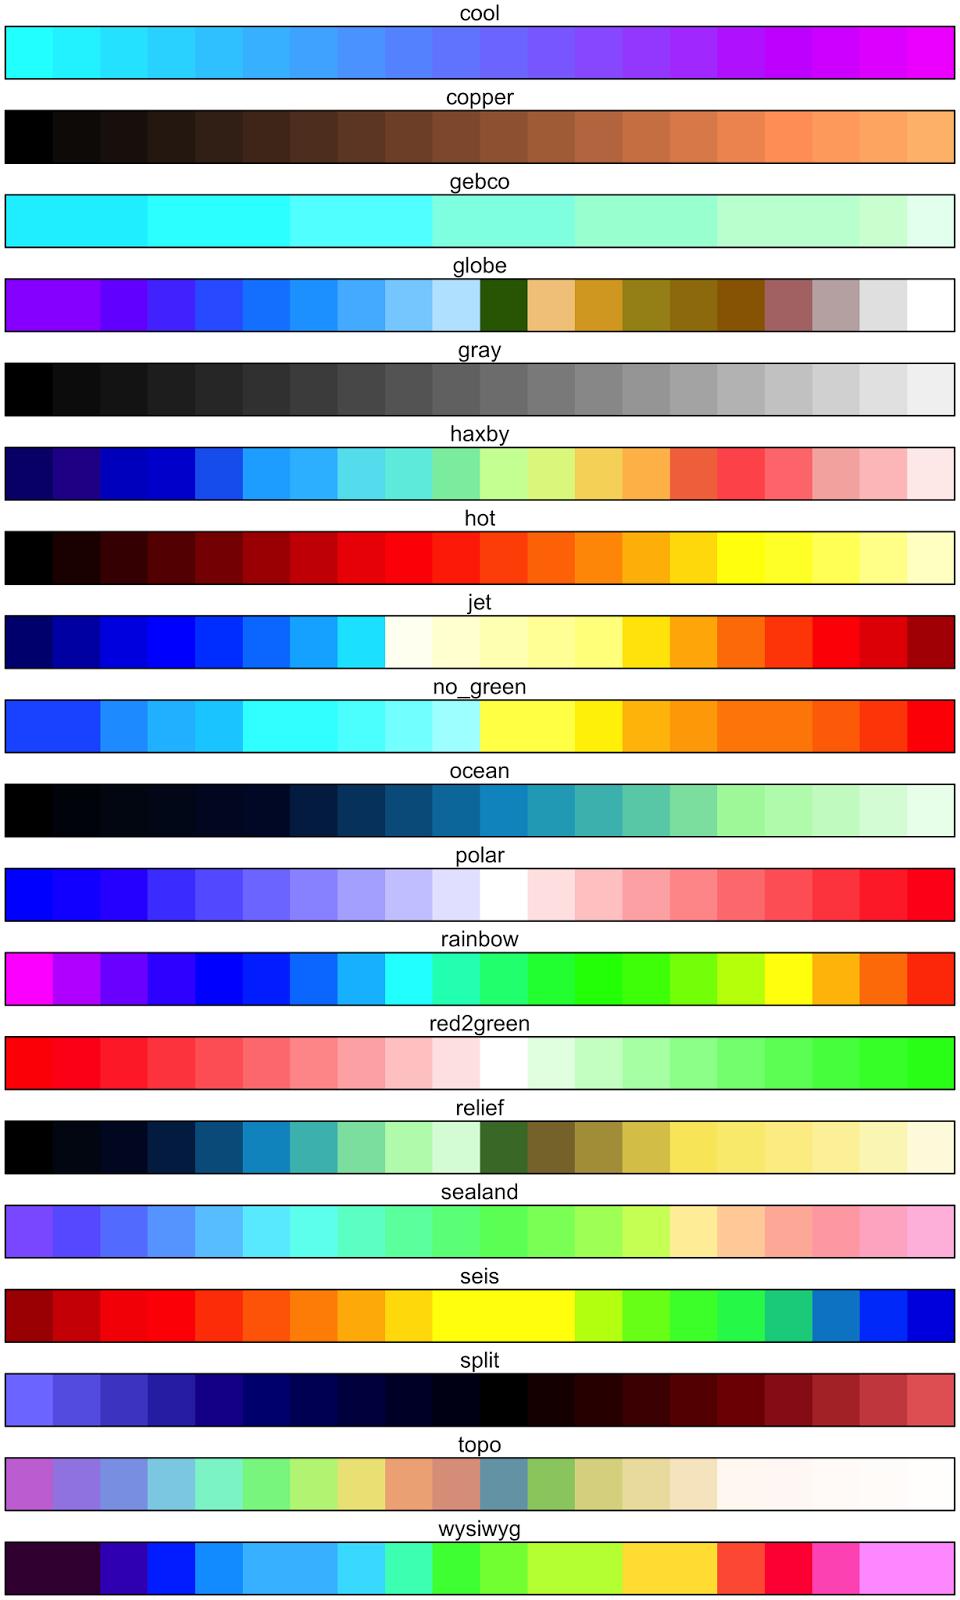 me nugget: GMT standard color palettes